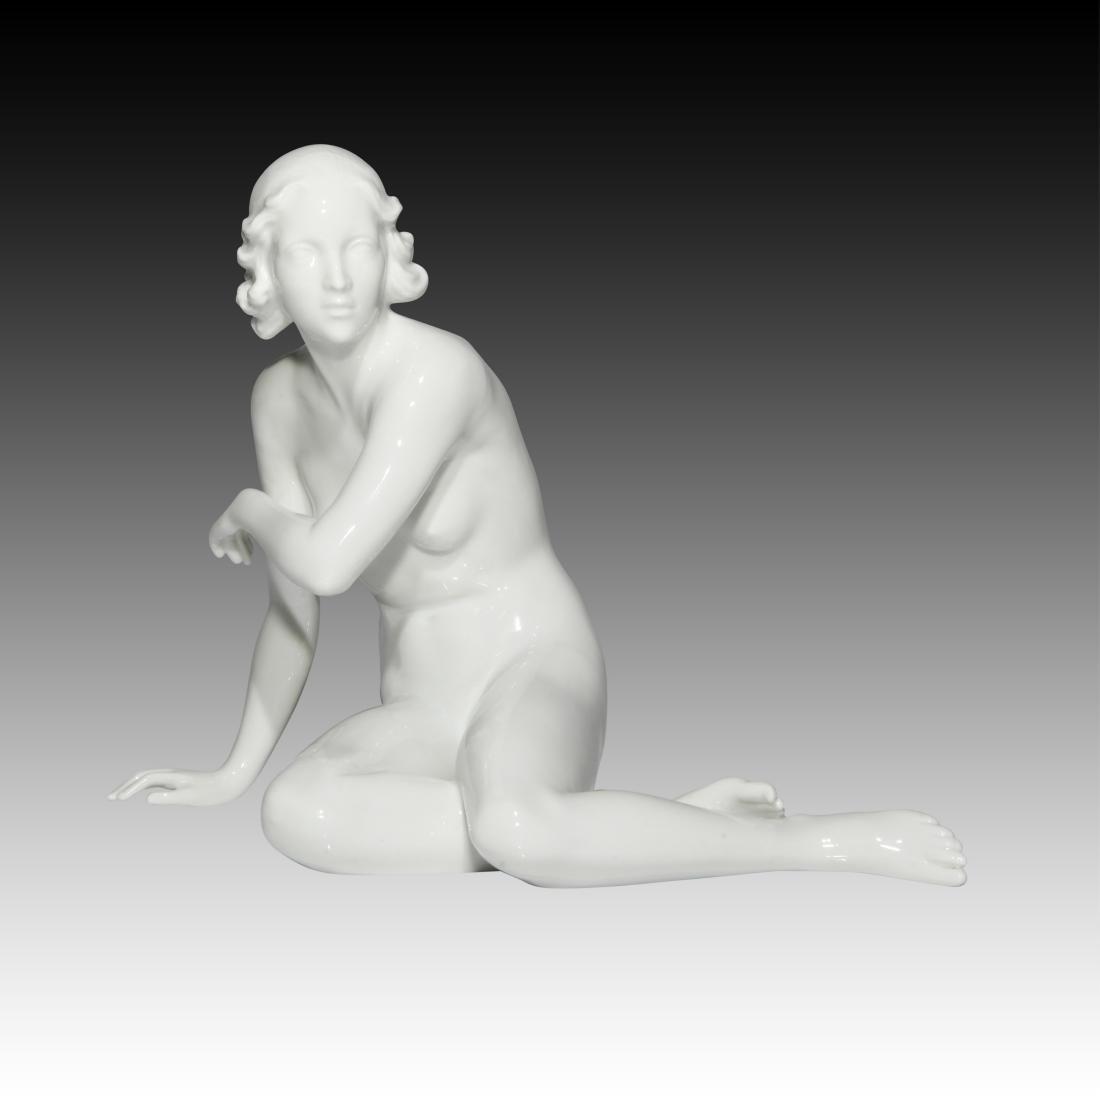 Rosenthal Nude Blanc de Chine Figurine